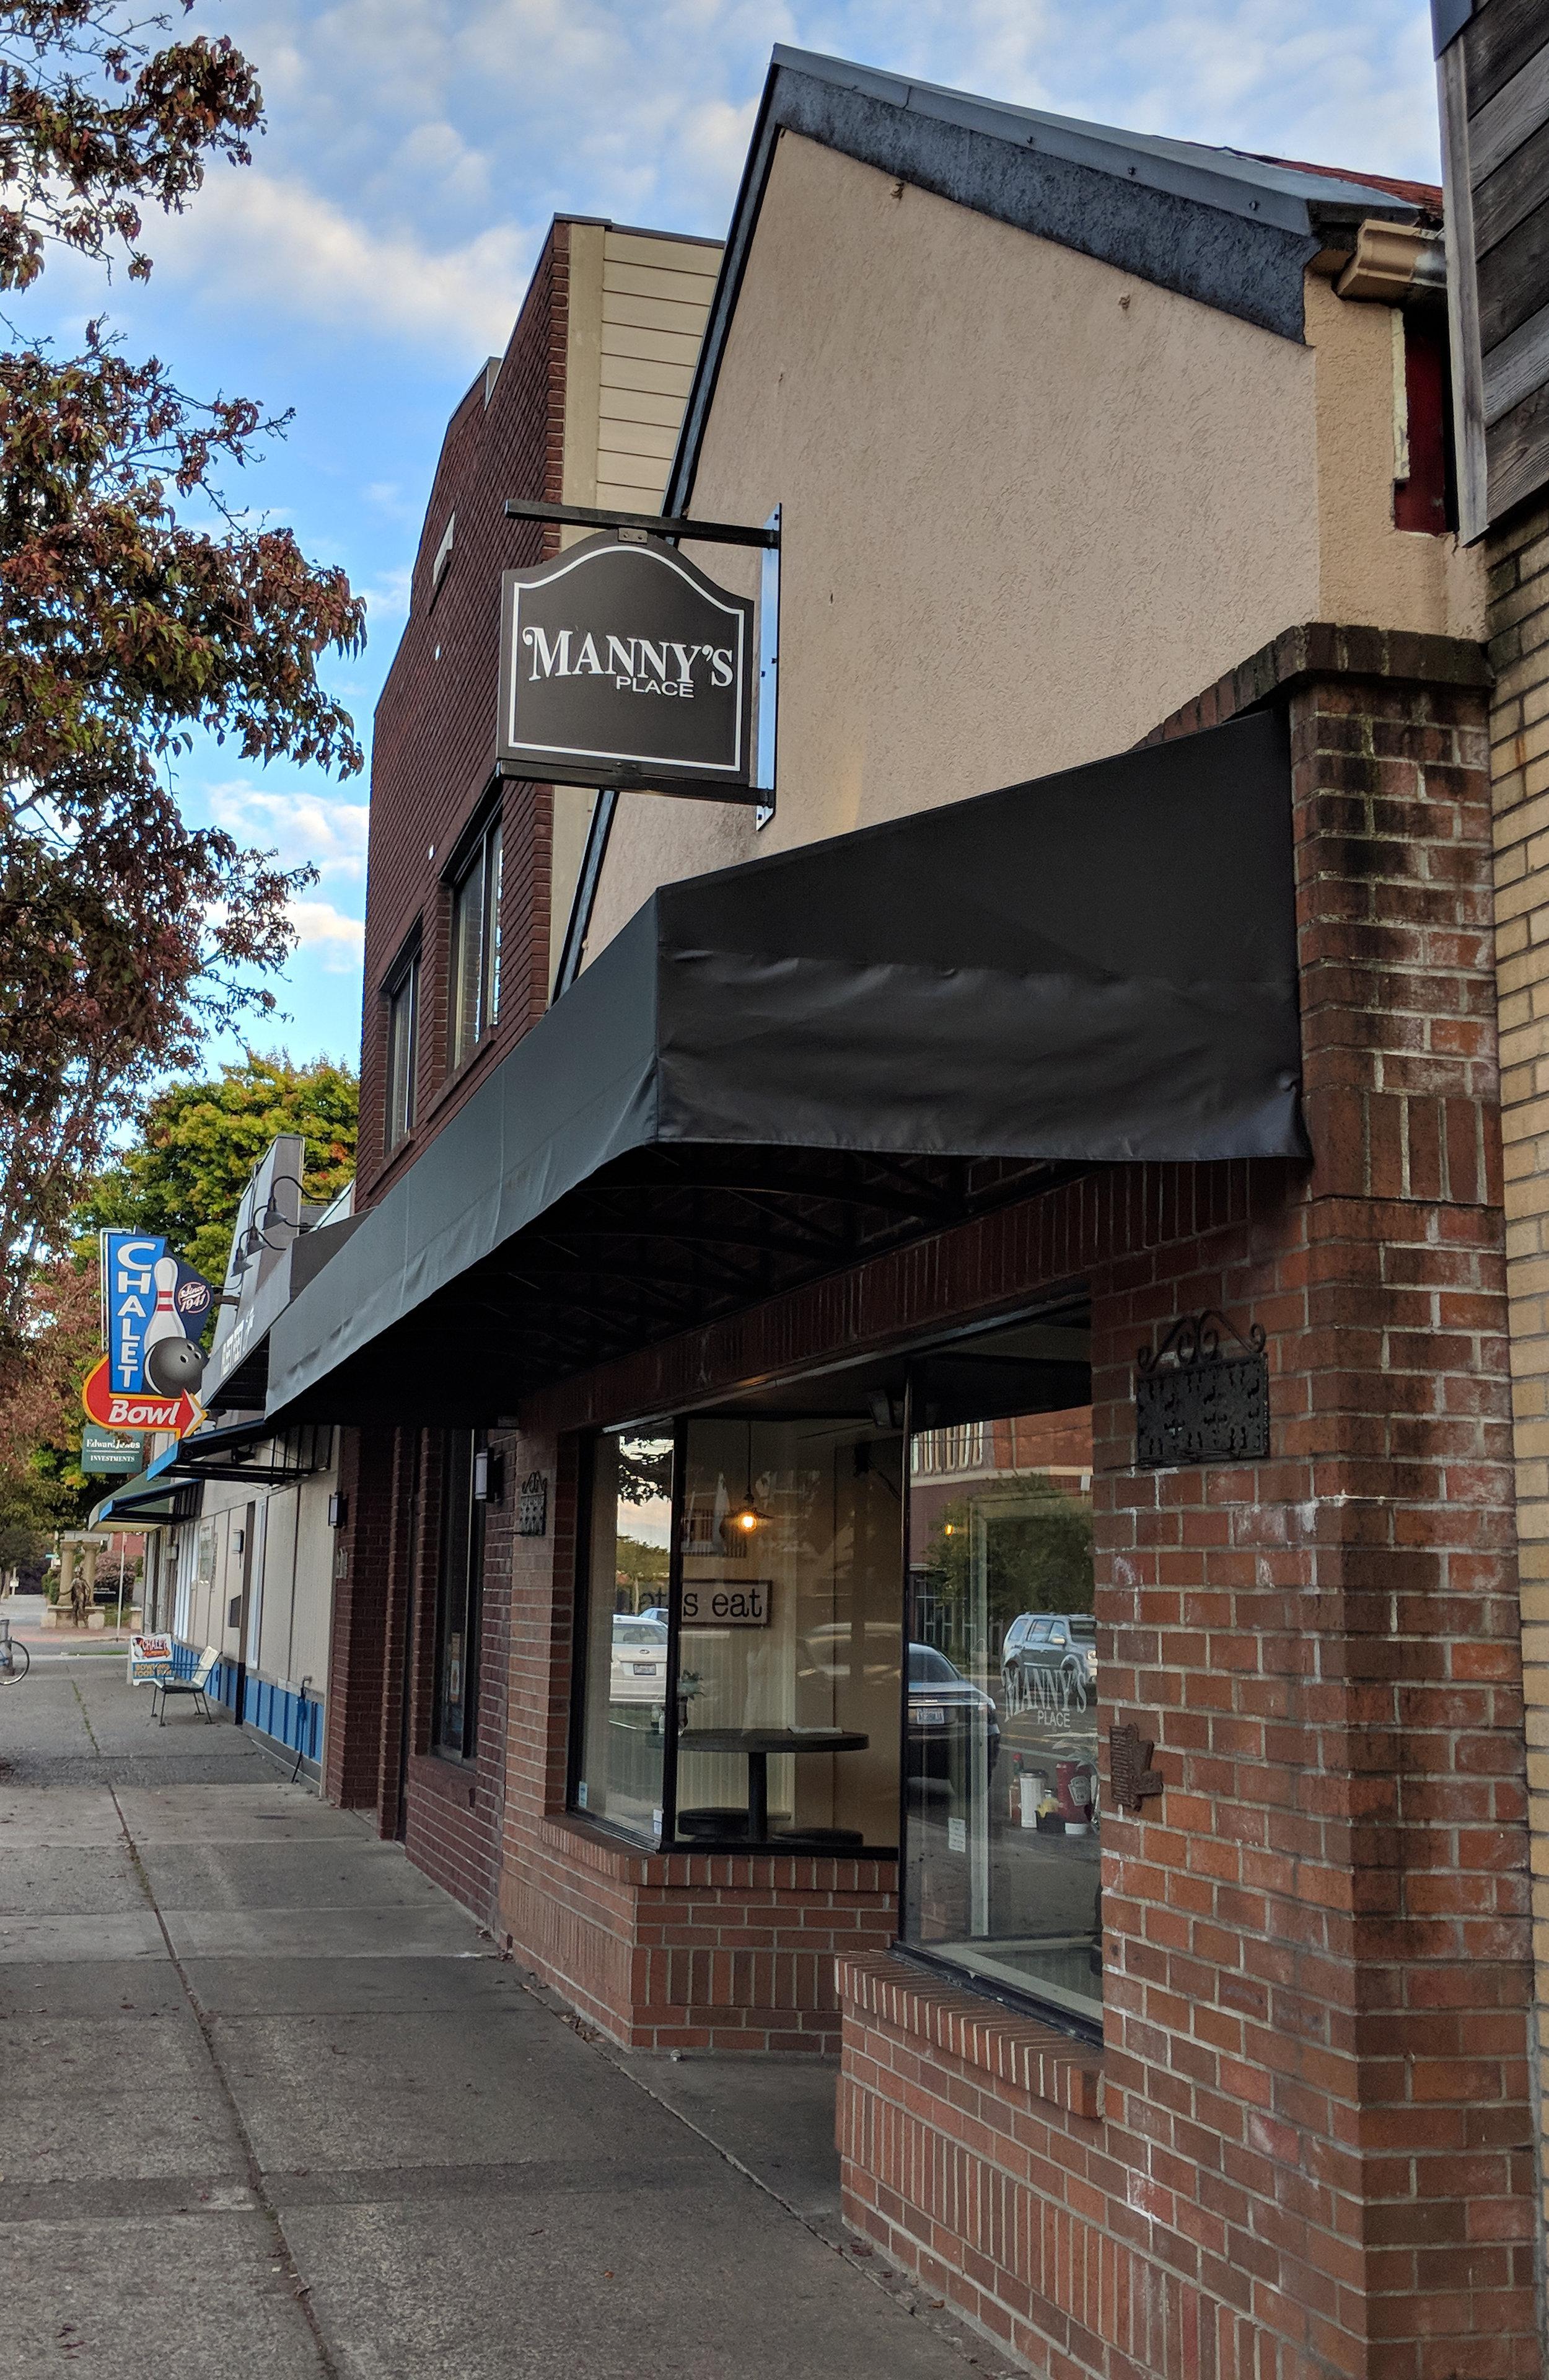 Mannys_Place_Tacoma_2.jpg